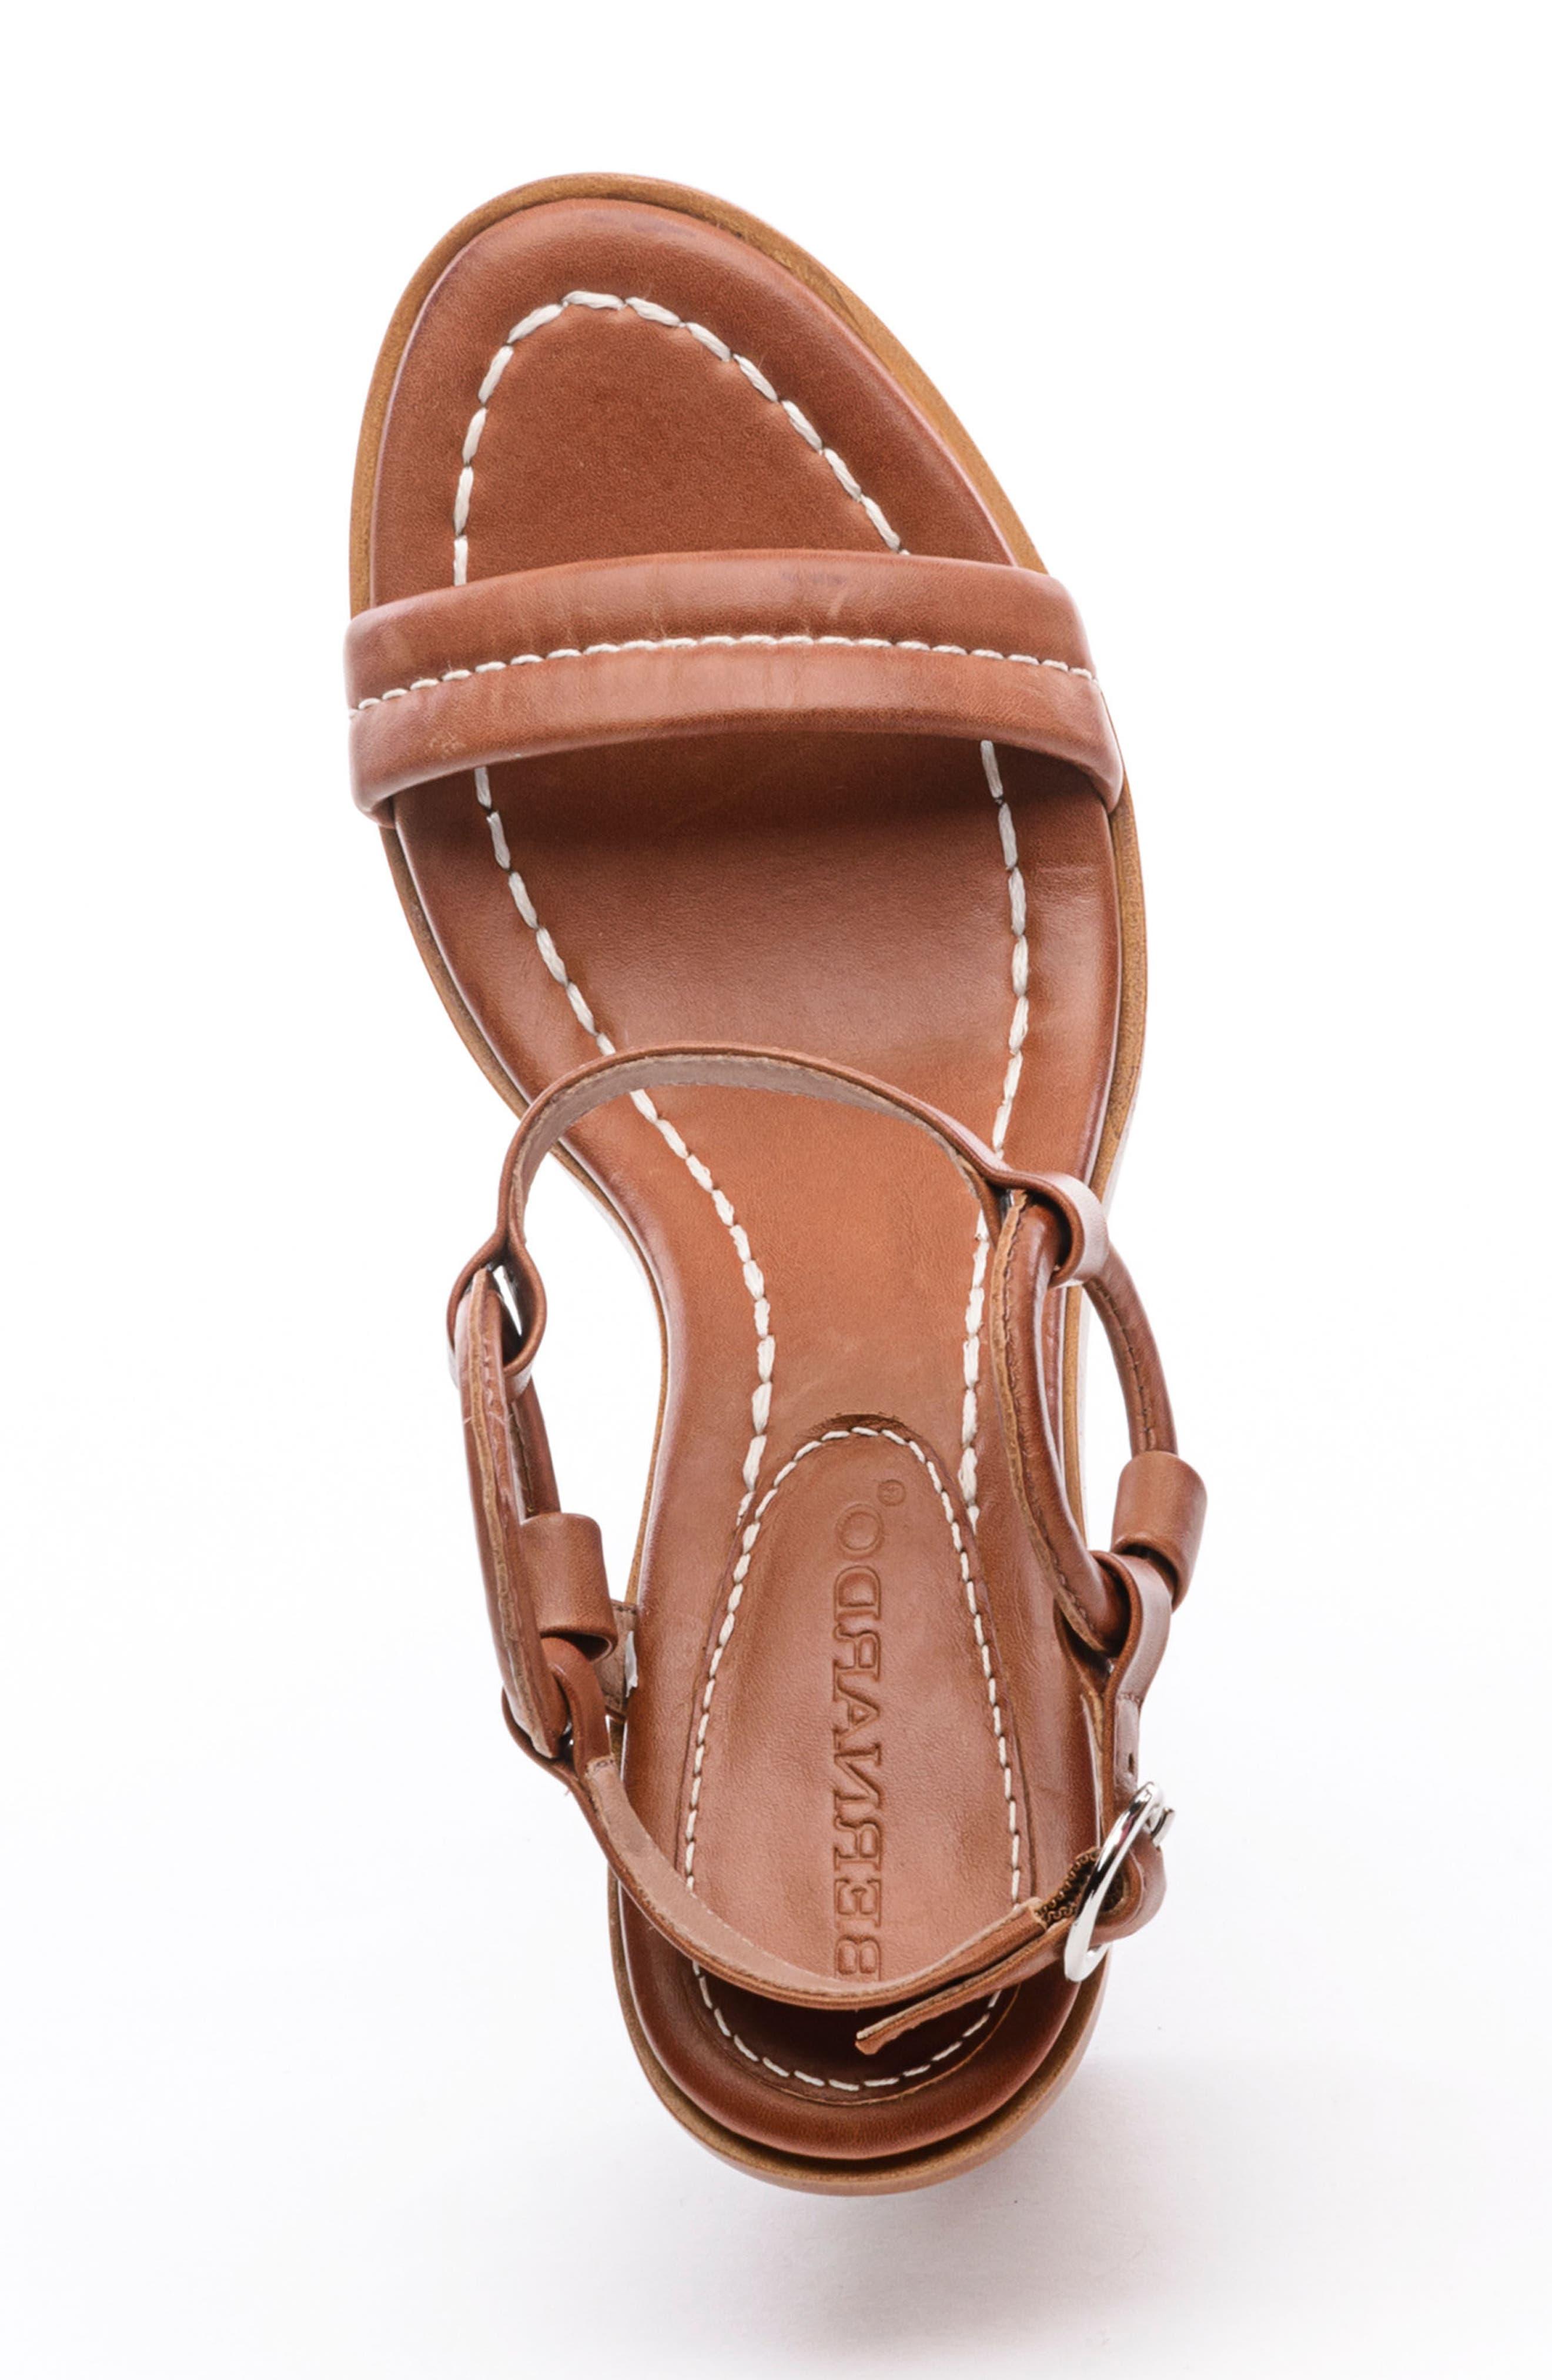 BERNARDO, Harlow Ankle Strap Sandal, Alternate thumbnail 5, color, LUGGAGE LEATHER